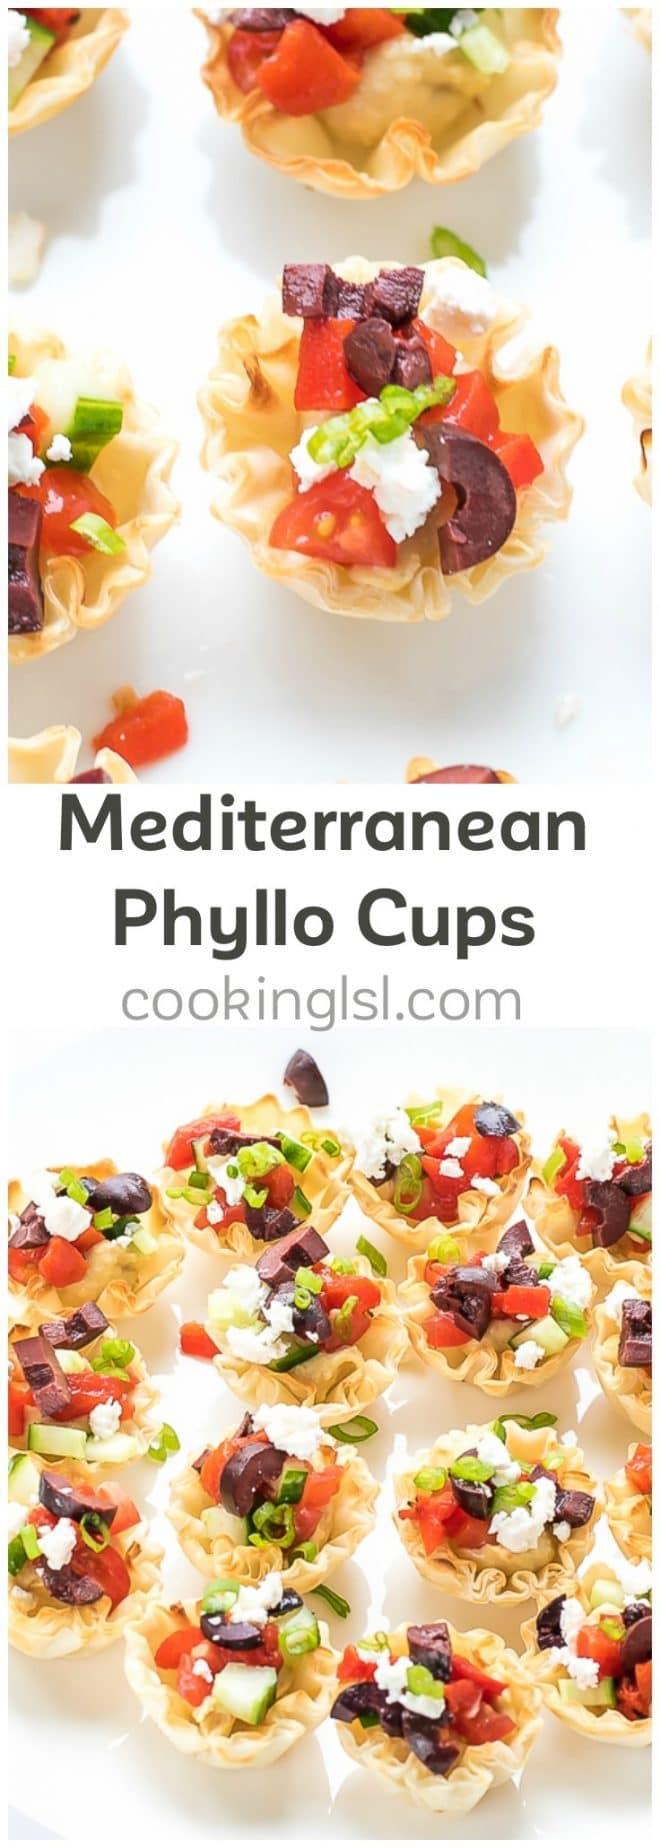 Mediterranean Phyllo Cups